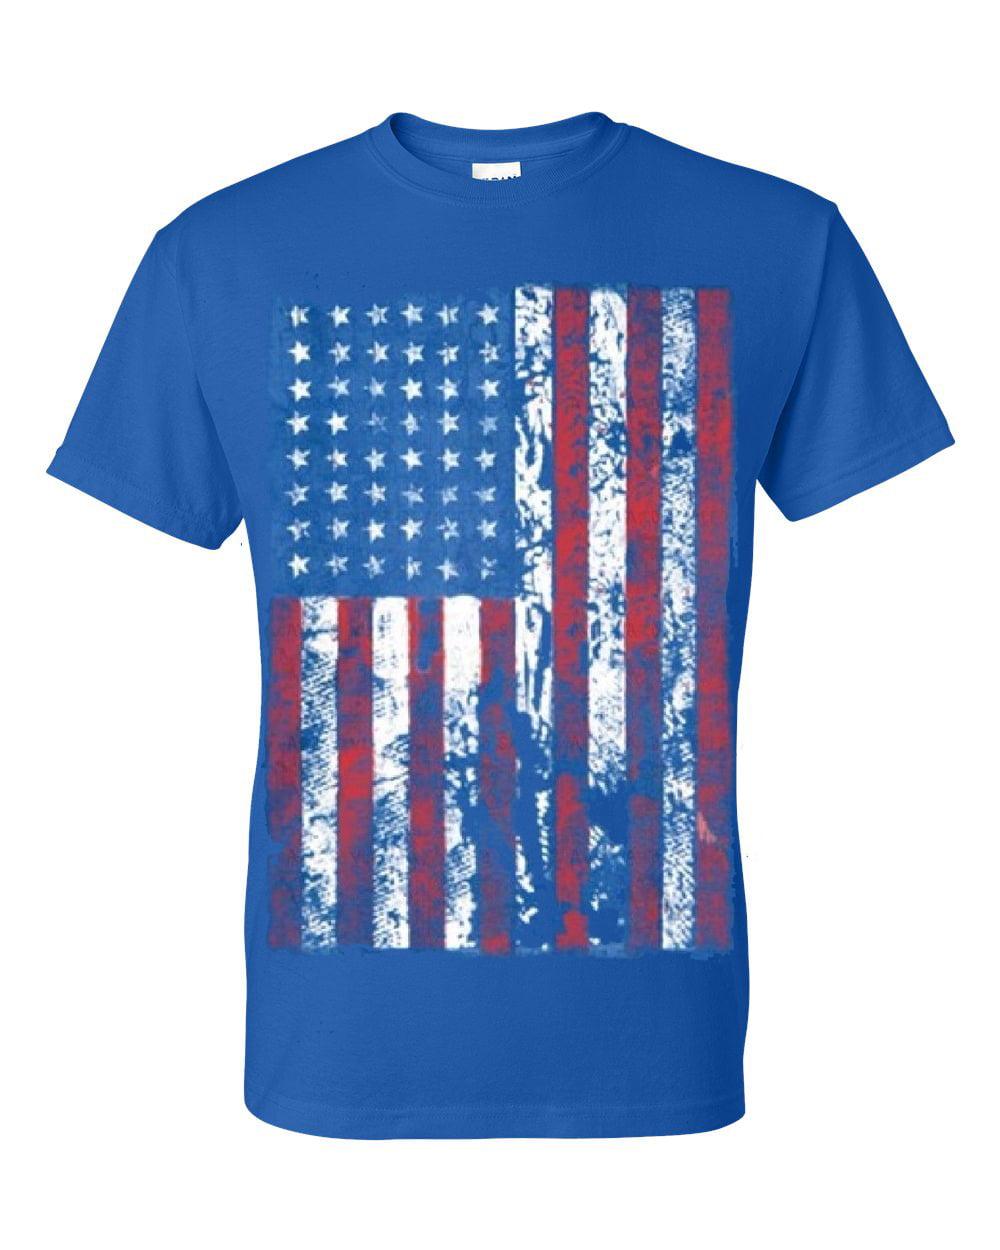 92ff7df05c2 Distressed American Flag USA Patriotic Clothing Mens Unisex Top T-Shirt